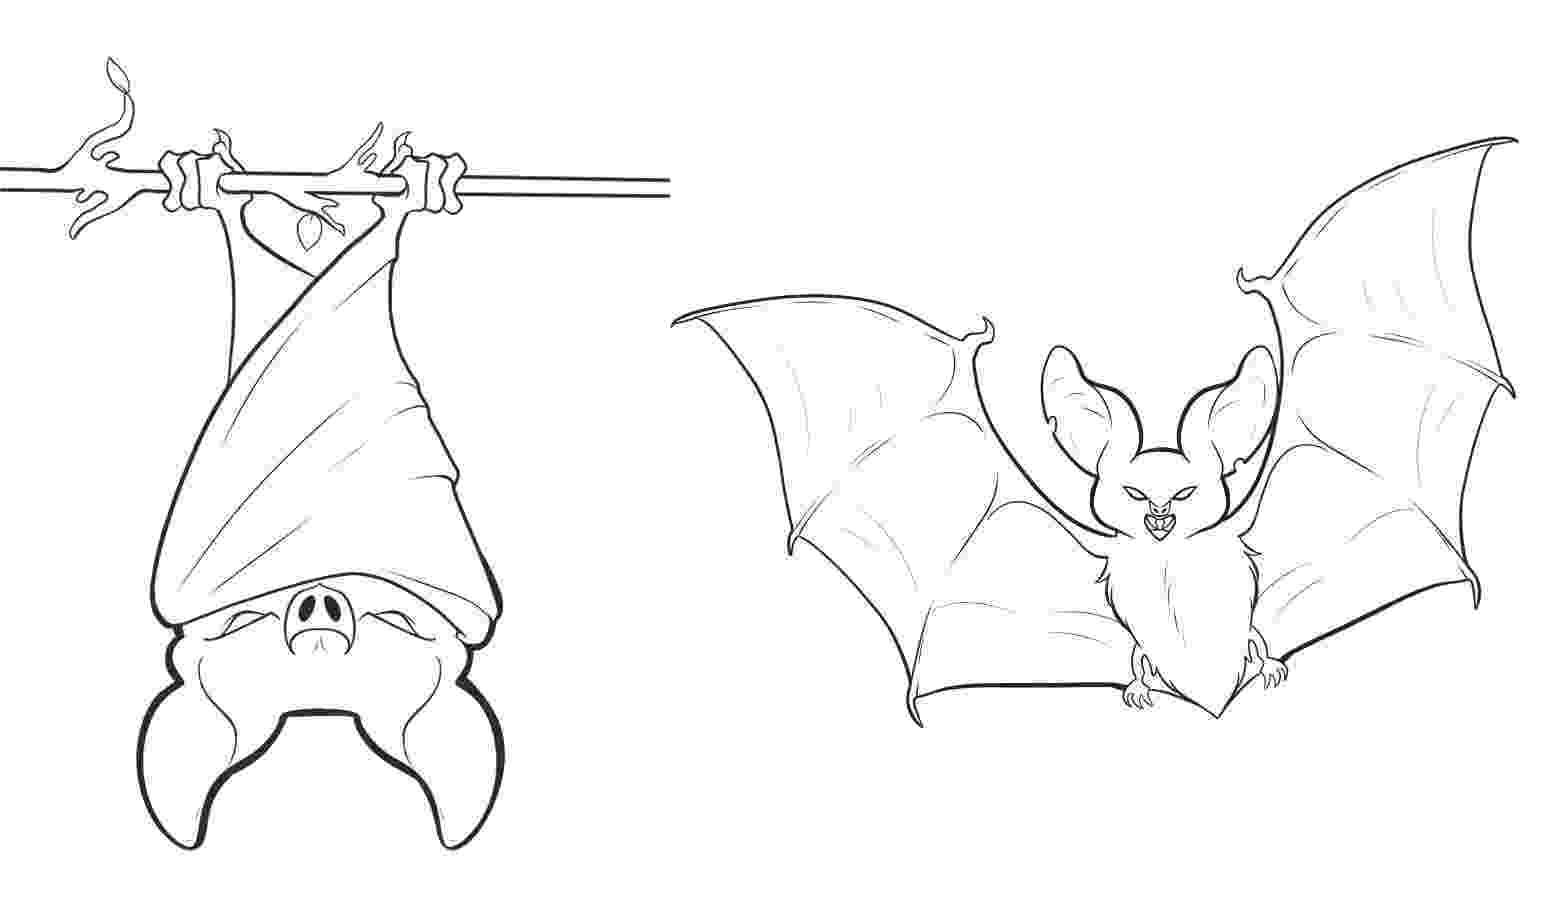 bats coloring pages free printable bat coloring pages for kids bats pages coloring